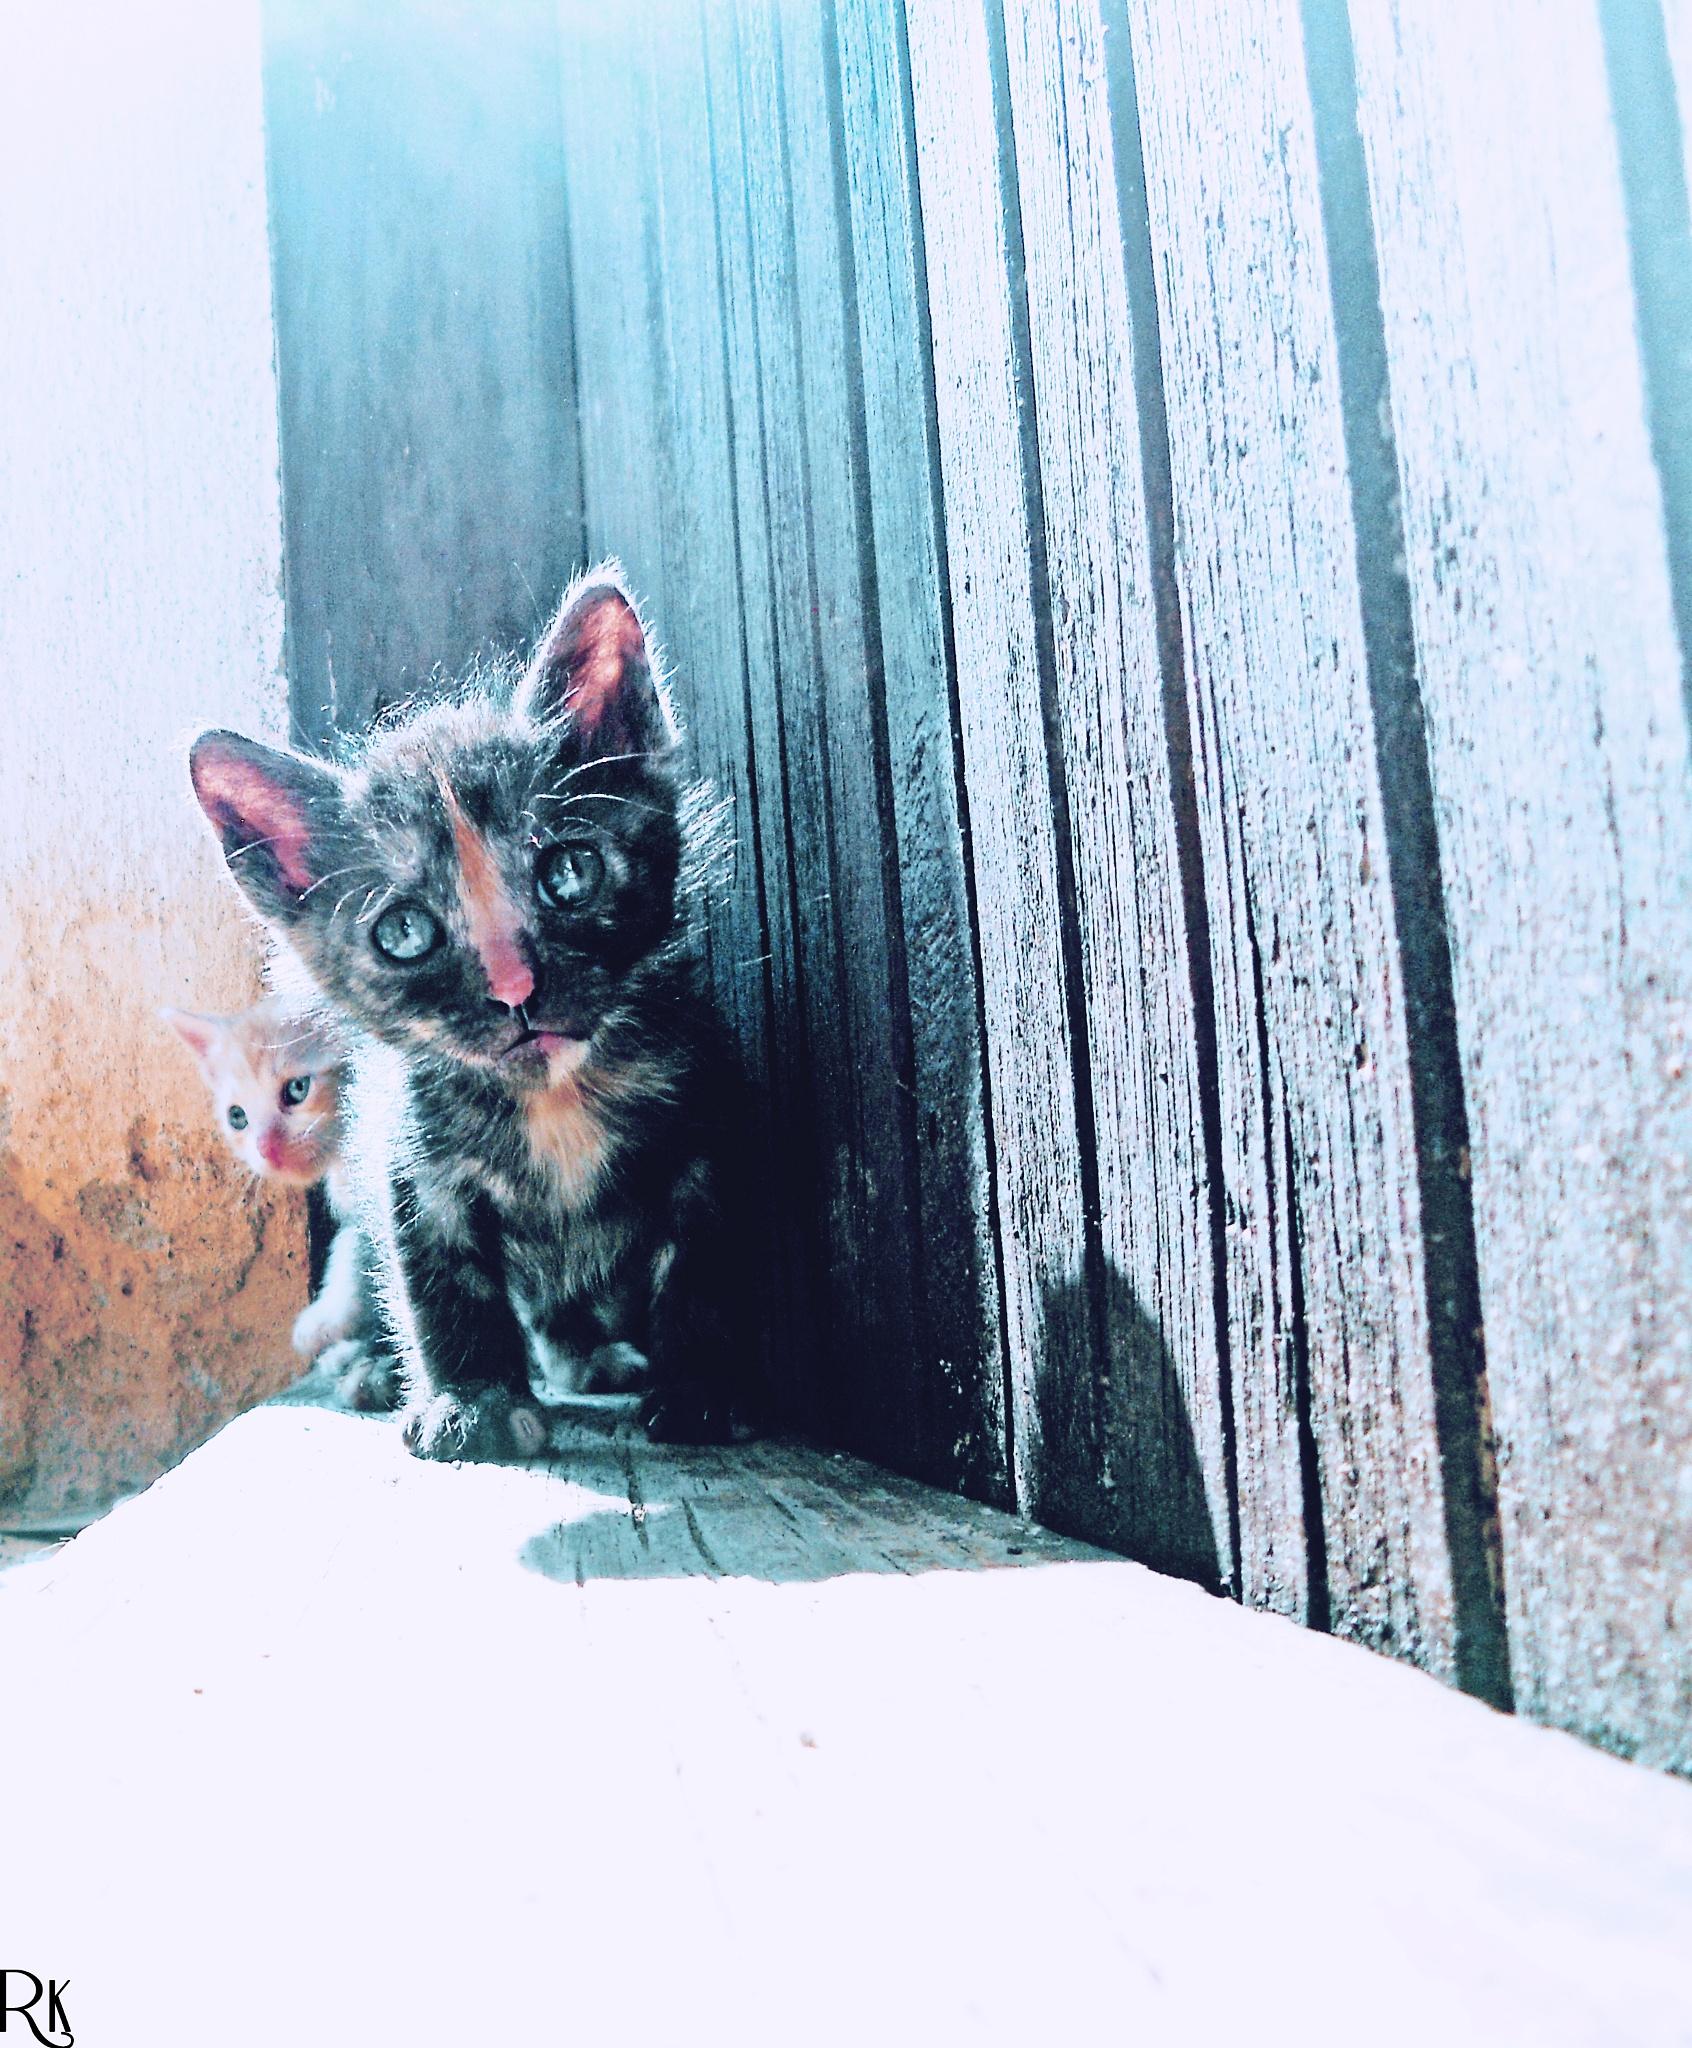 Black kitty @catsedition7 by Robert Krstevski